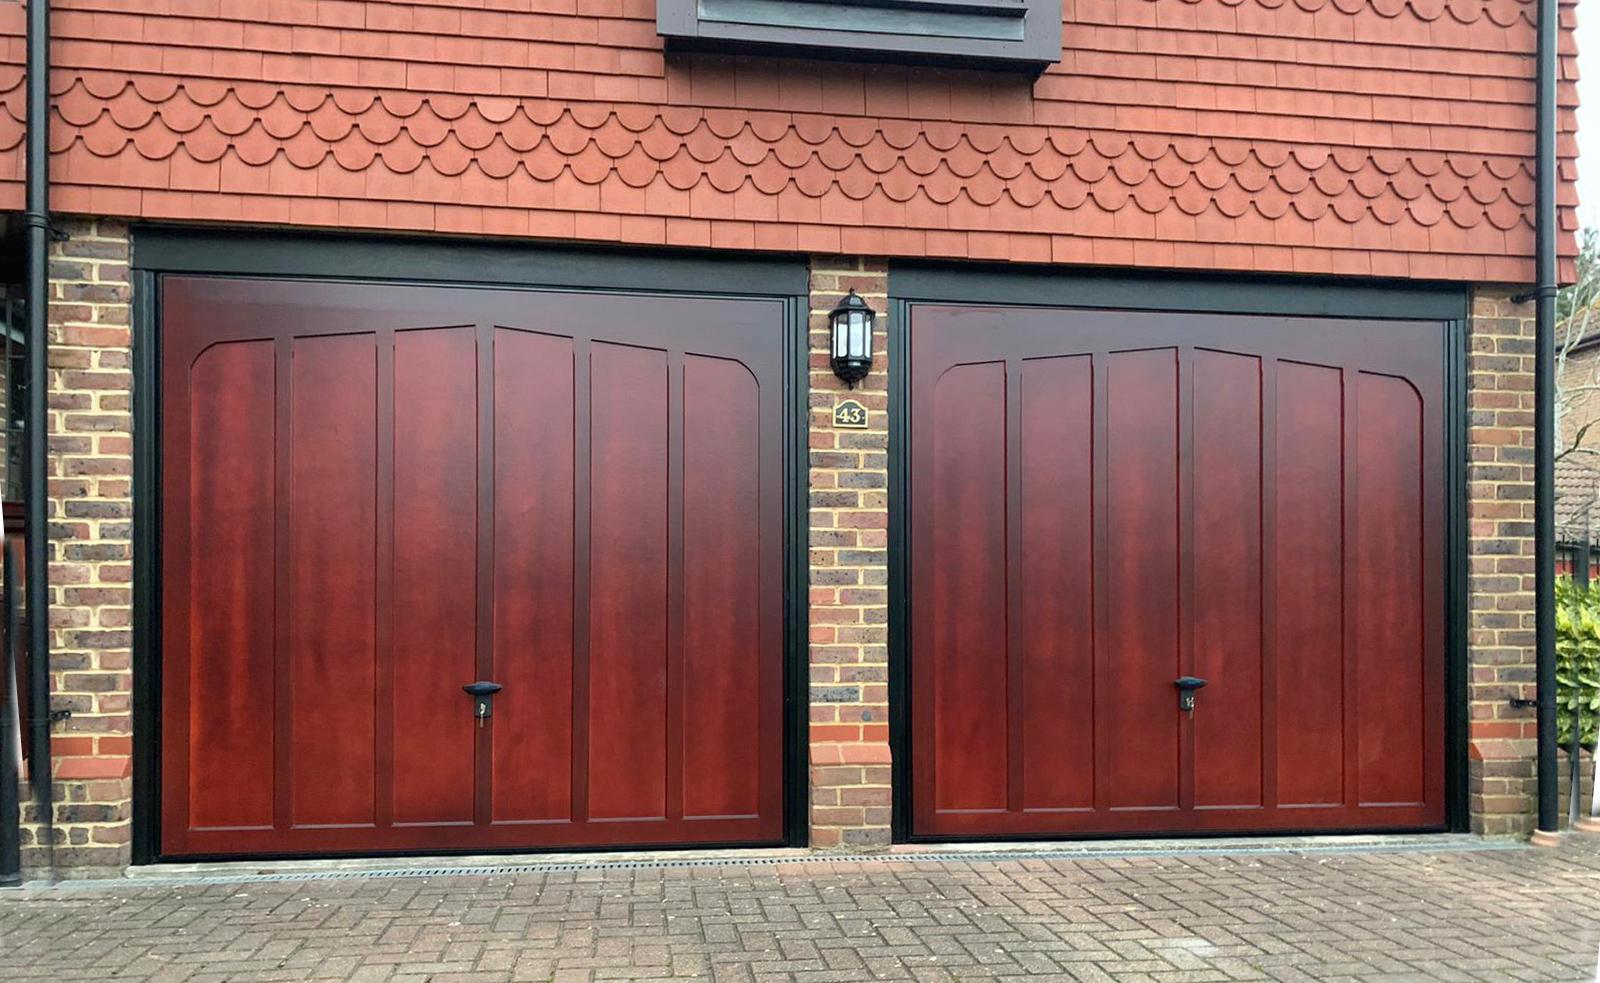 2x Cardale Tudor Cedarwood Canopy Up & Over Garage Doors Finished in Mahogany